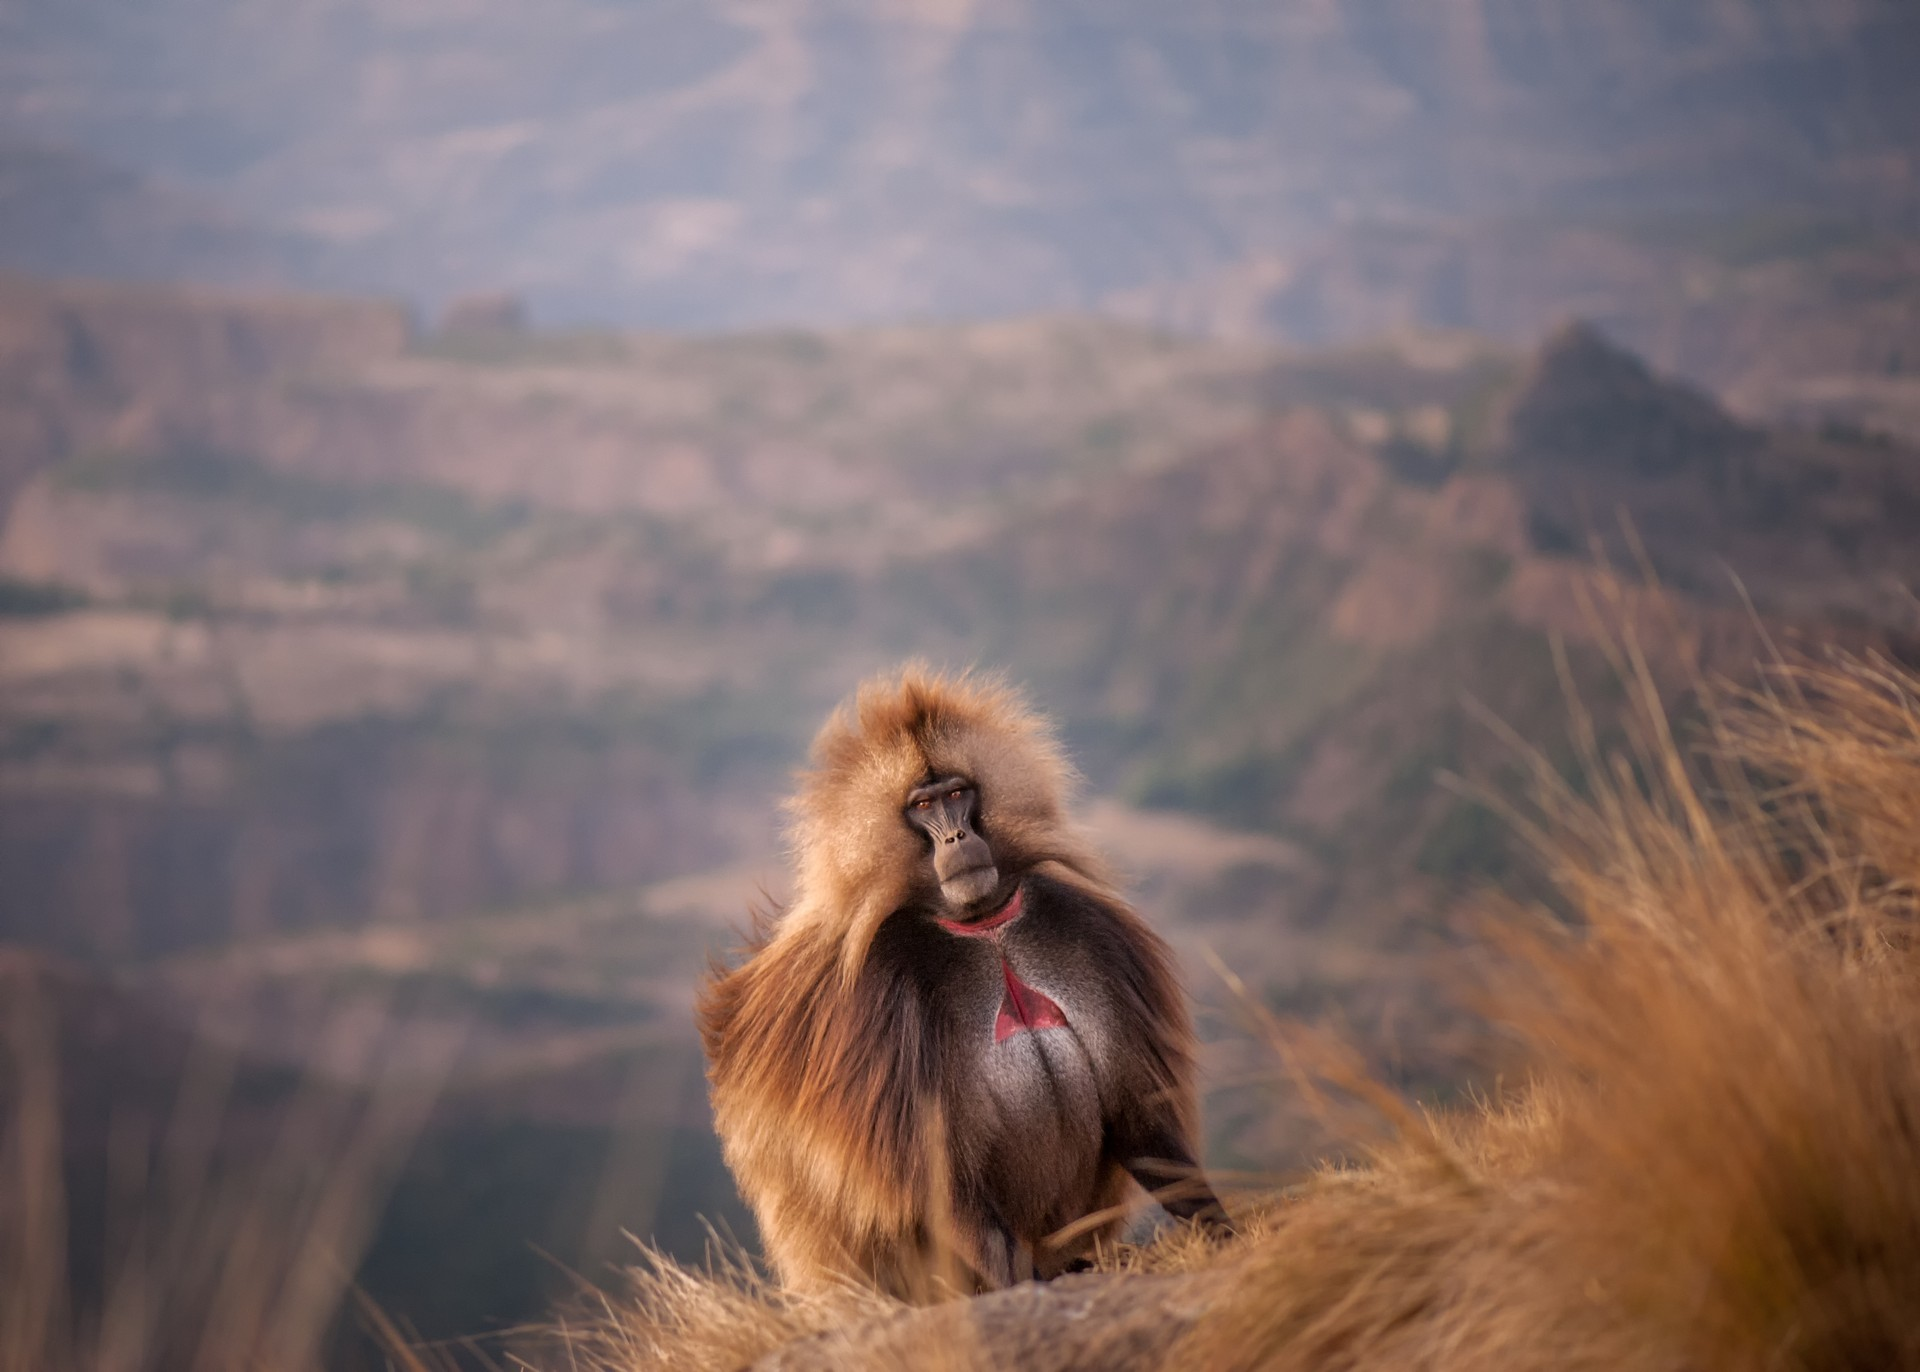 Gelada baboon in Ethiopia